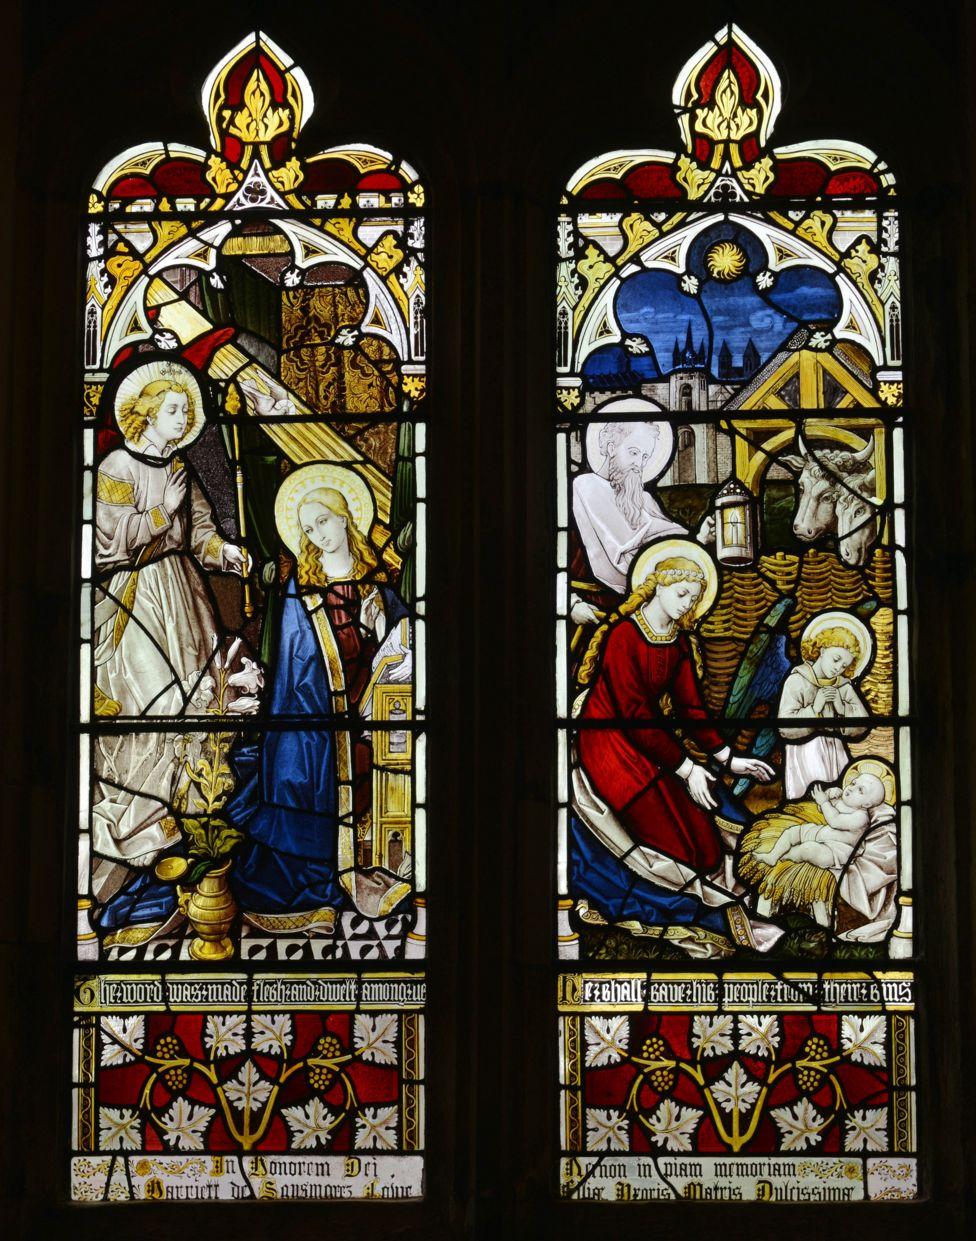 英国东萨塞克斯圣母教堂中的一幅玻璃窗画(the church of St Mary the Virgin, Willingdon, East Sussex)